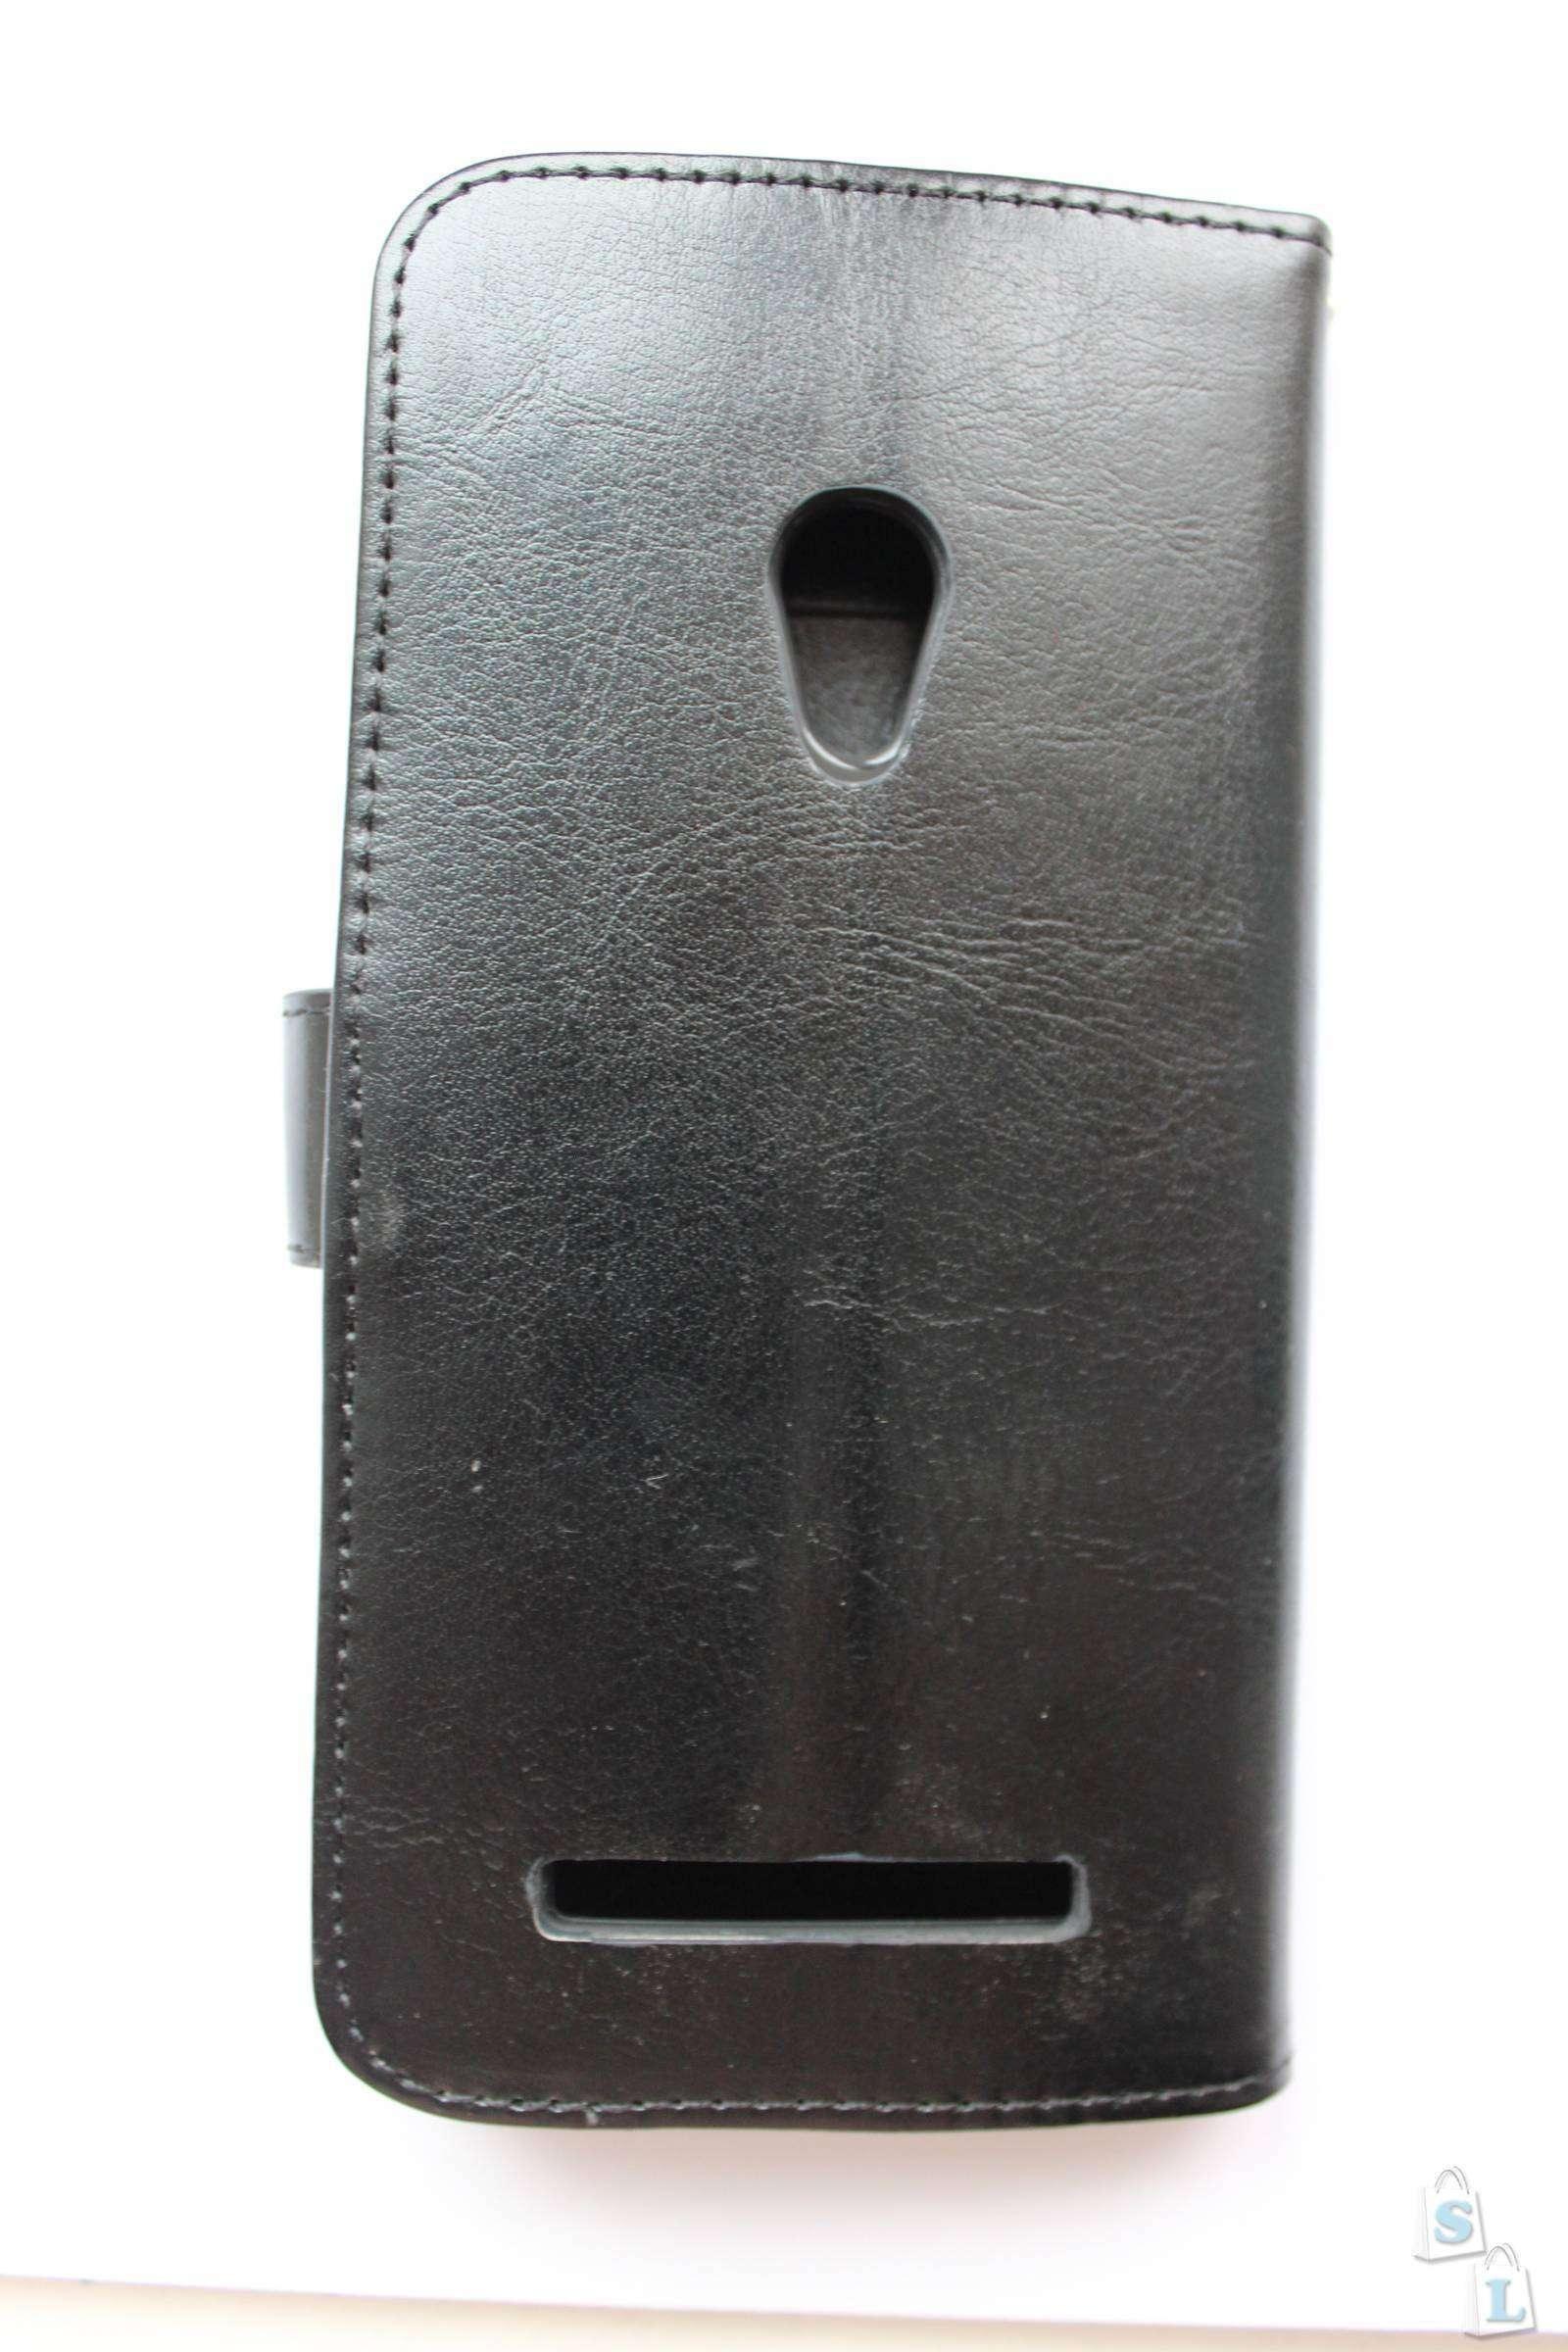 Aliexpress: Чехол для Asus Zenfone 5